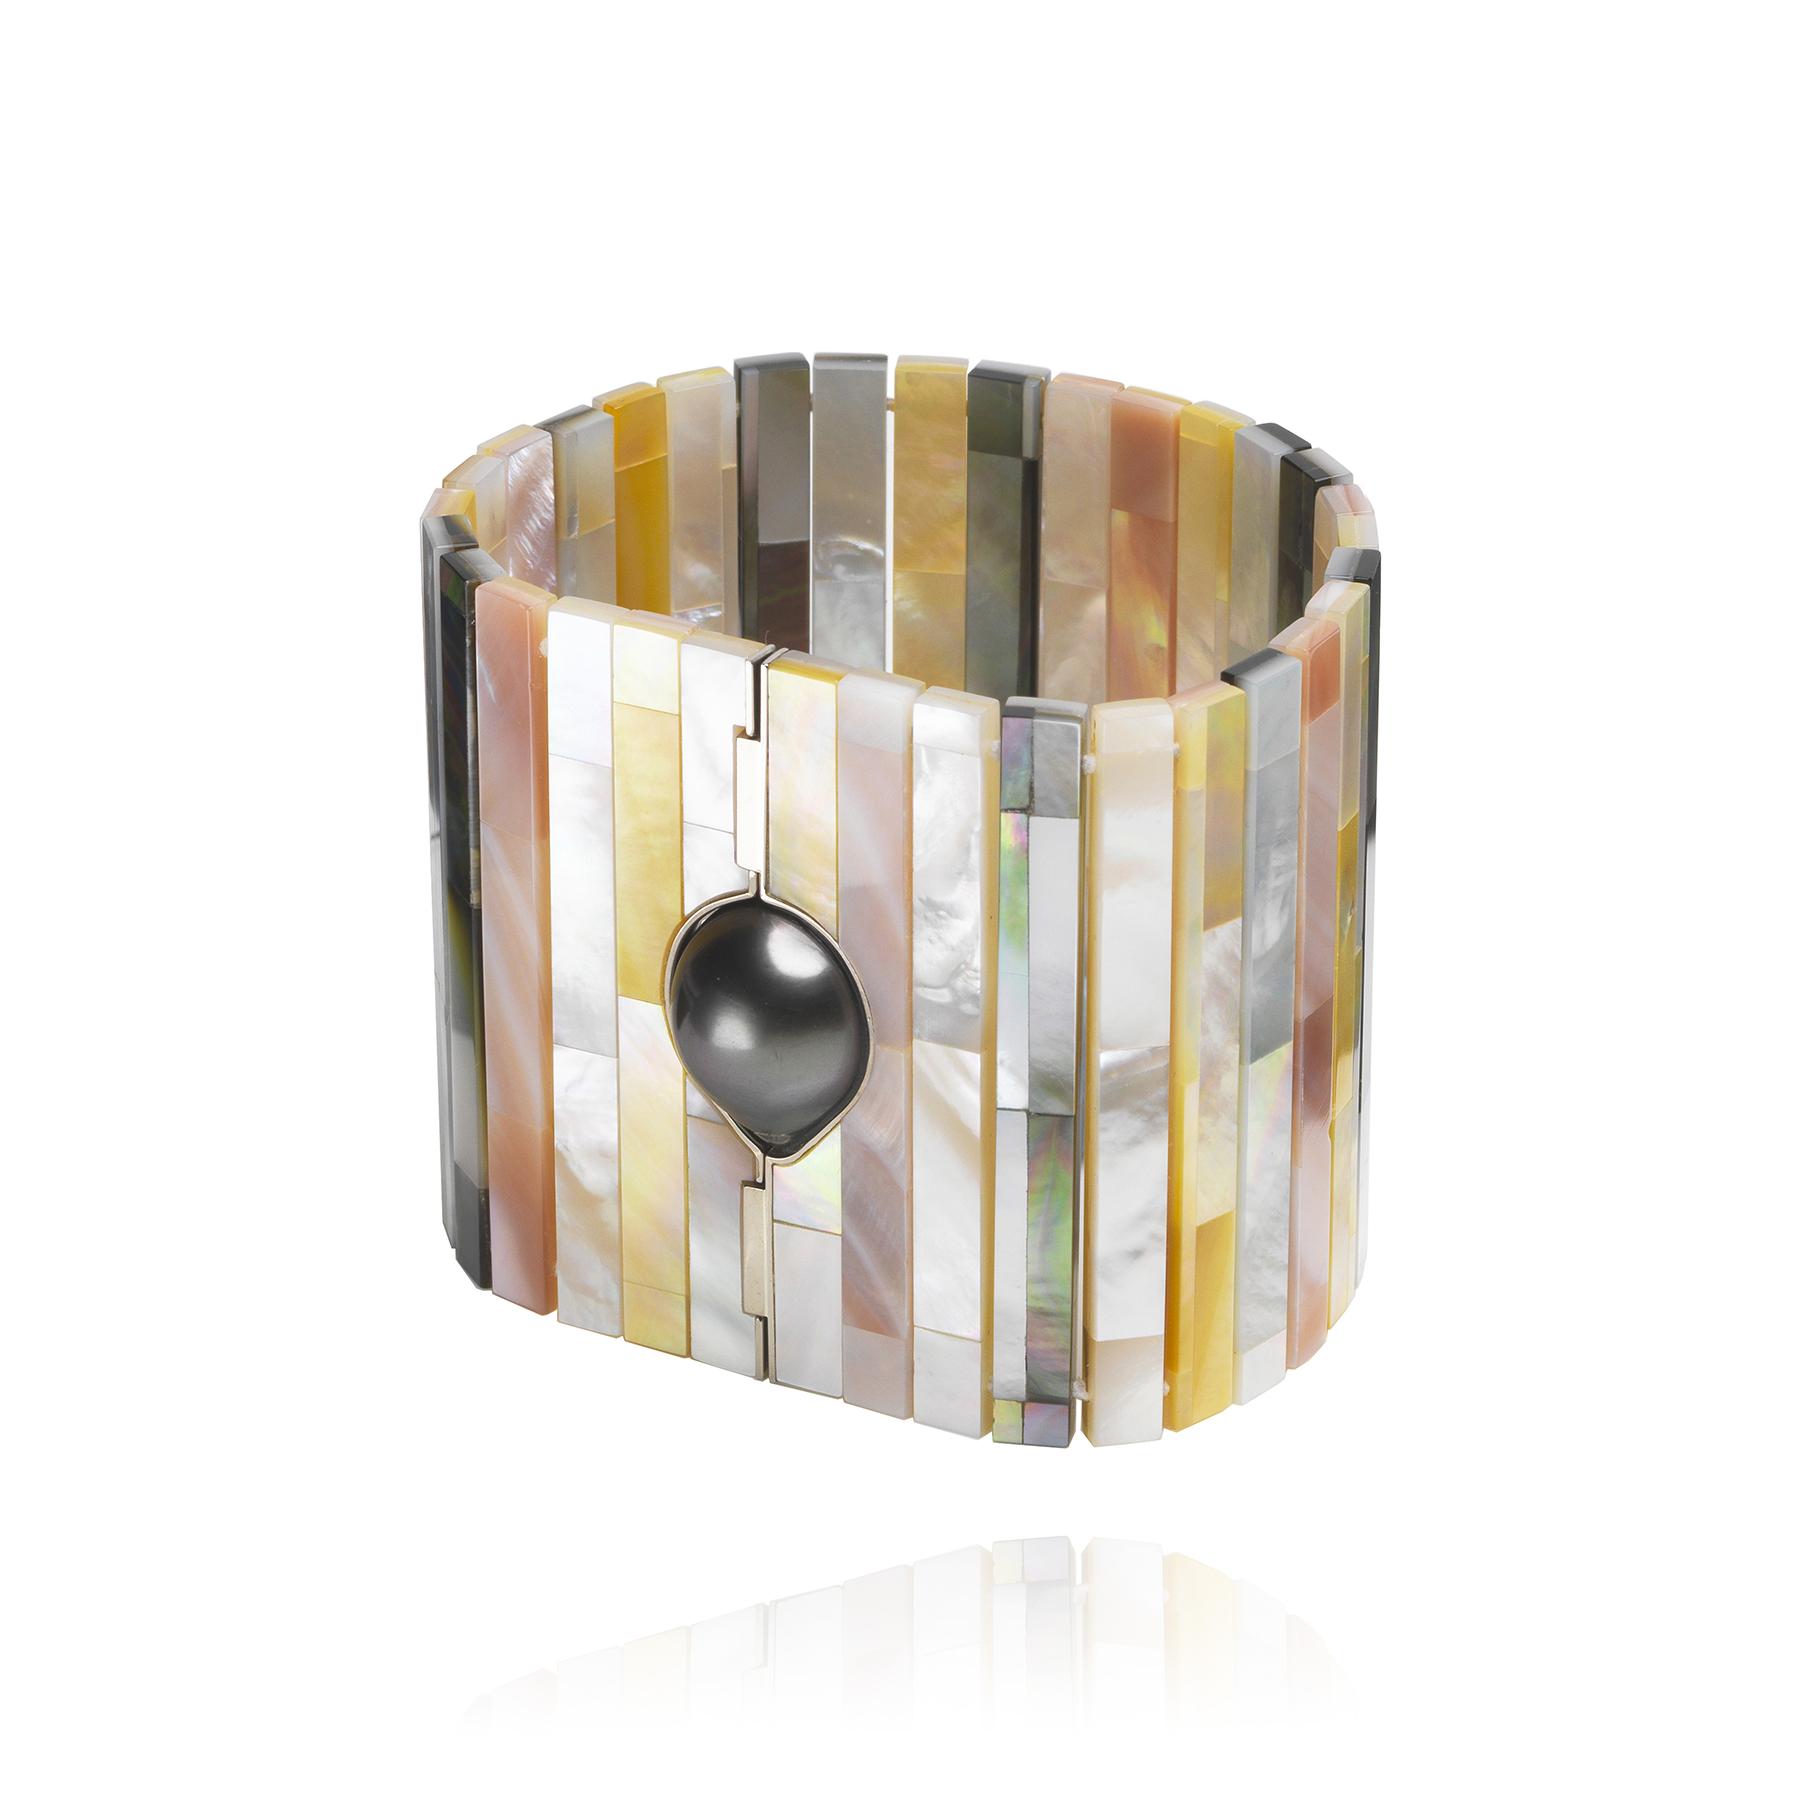 Tiles MOP Bracelet (Image Courtesy of Melanie Georgacopoulos)